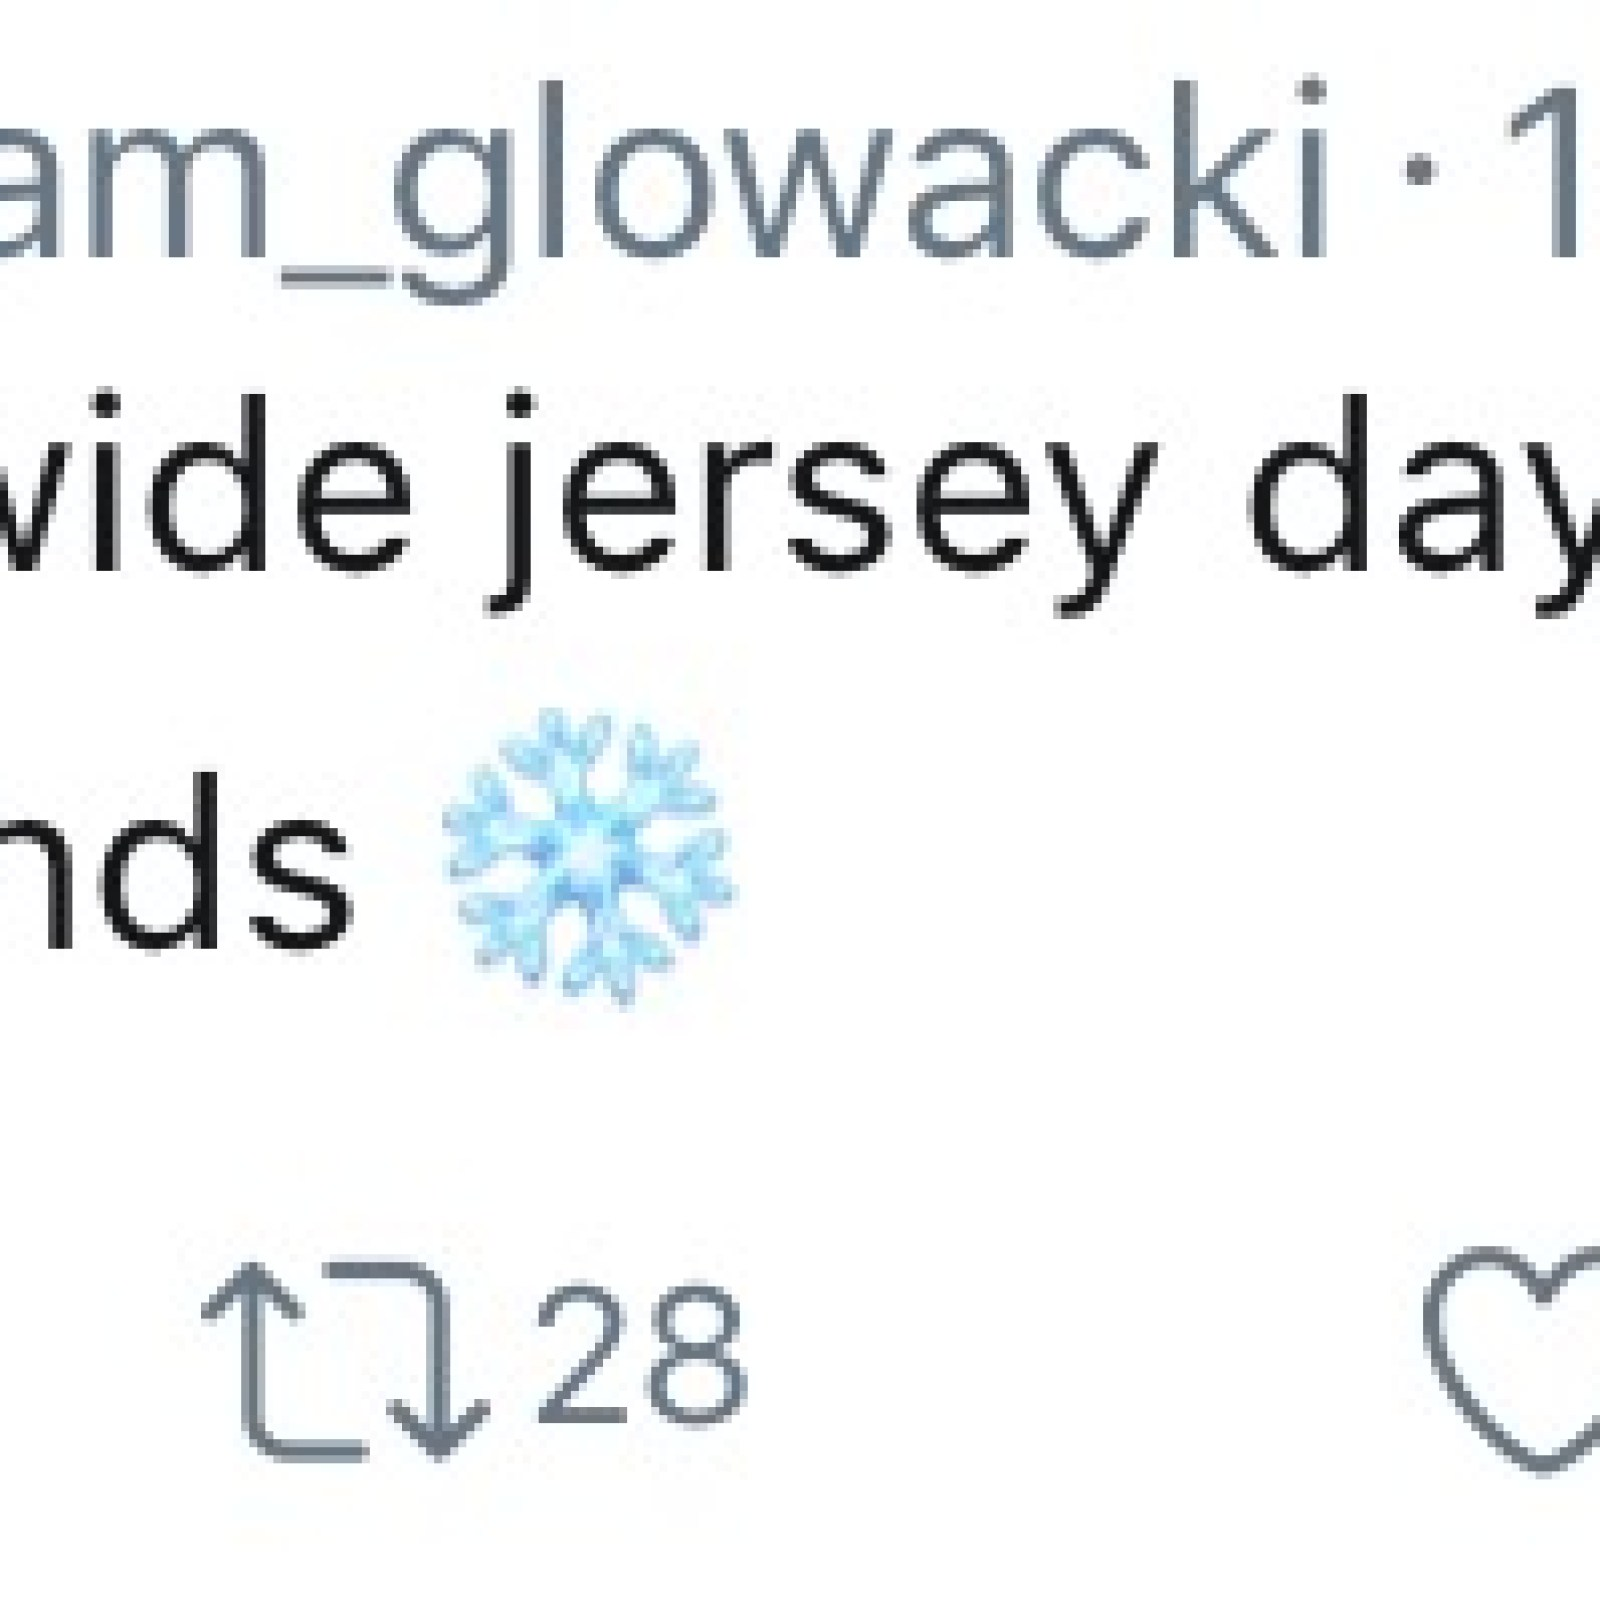 Cam Glowaki's Tweet